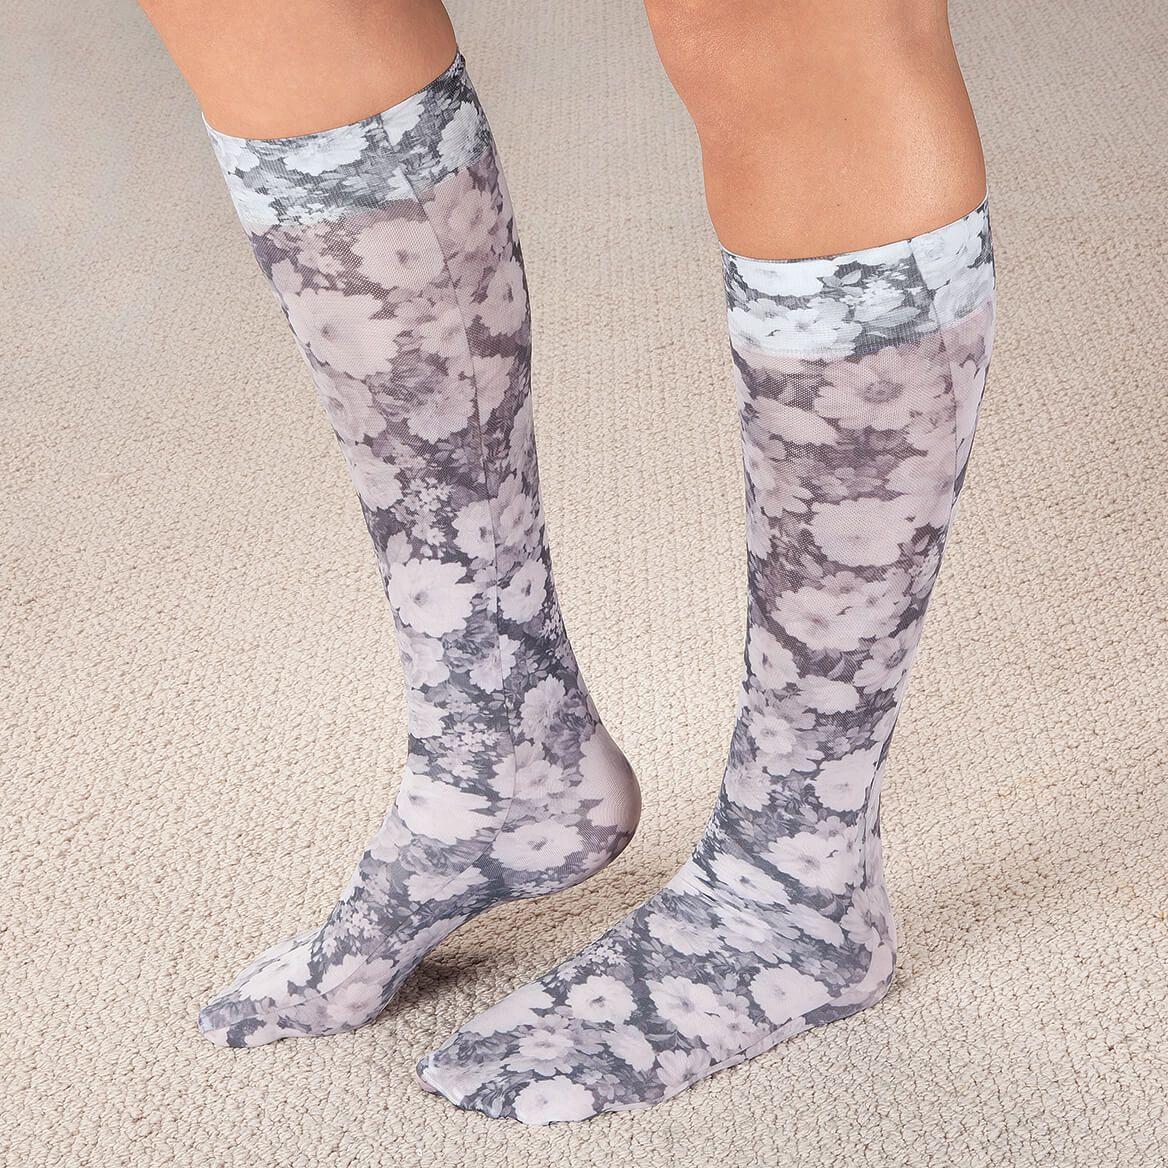 Celeste Stein Compression Socks 20-30mmHg-365483